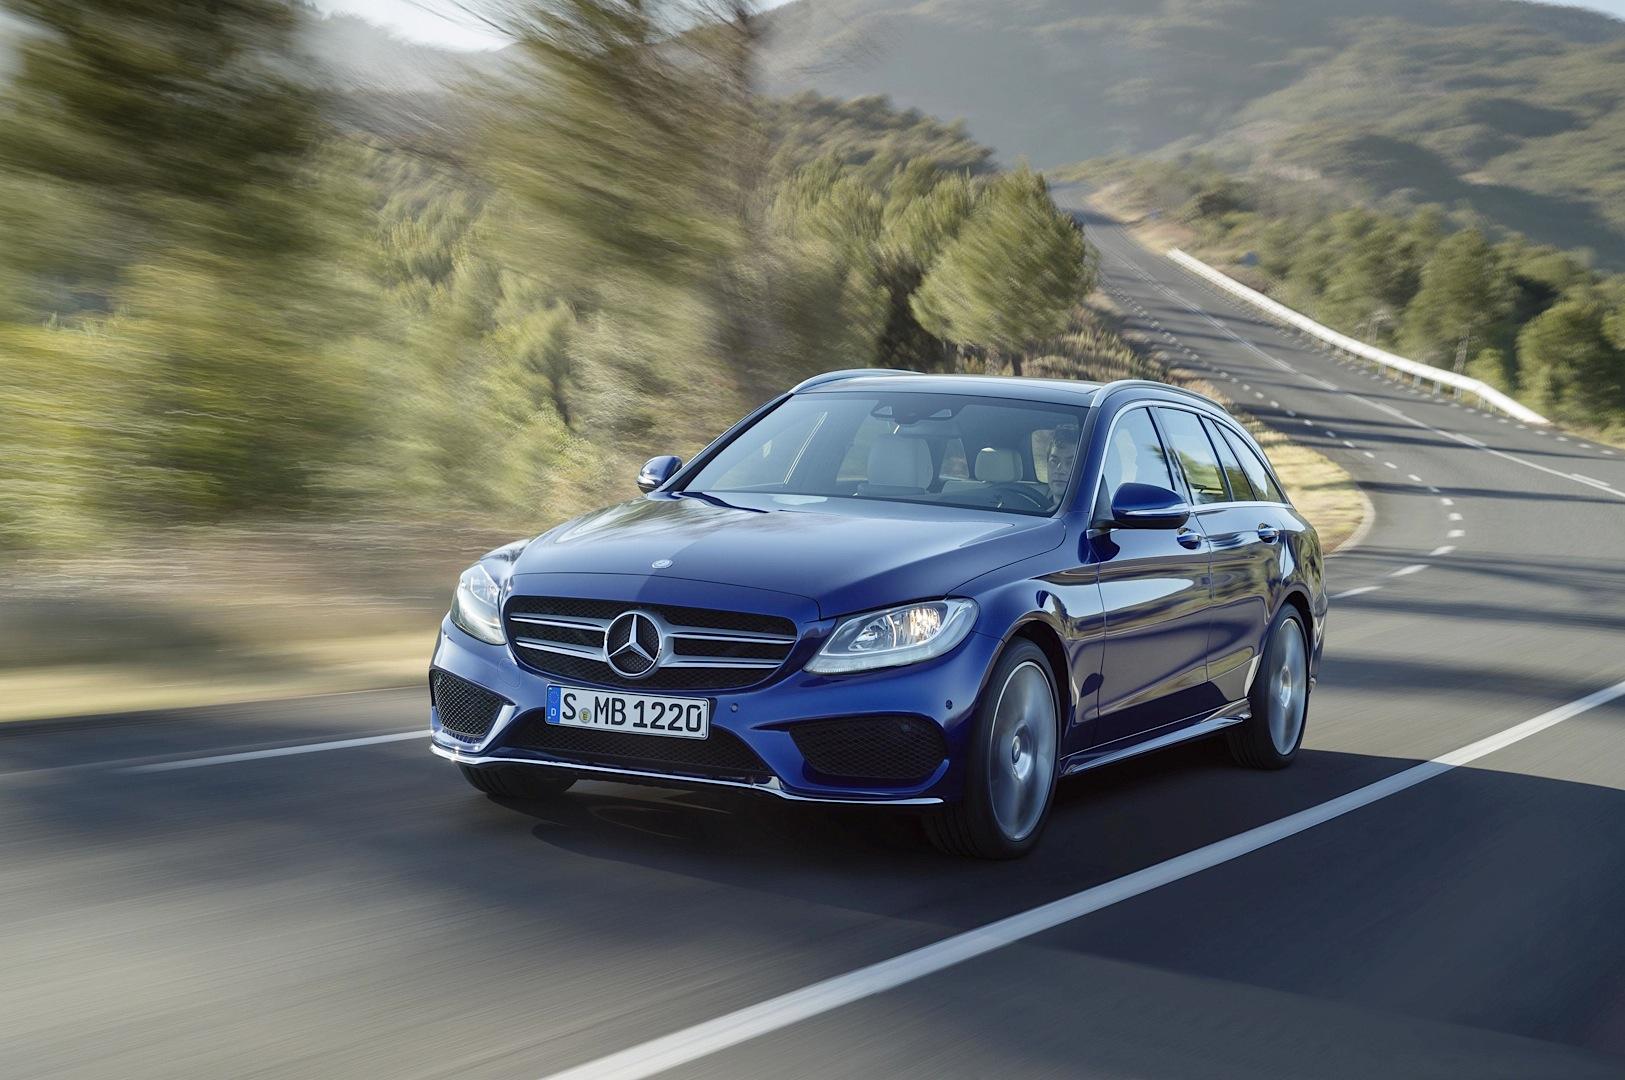 Mercedes benz c class estate s205 gets uk pricing for Price of mercedes benz c class